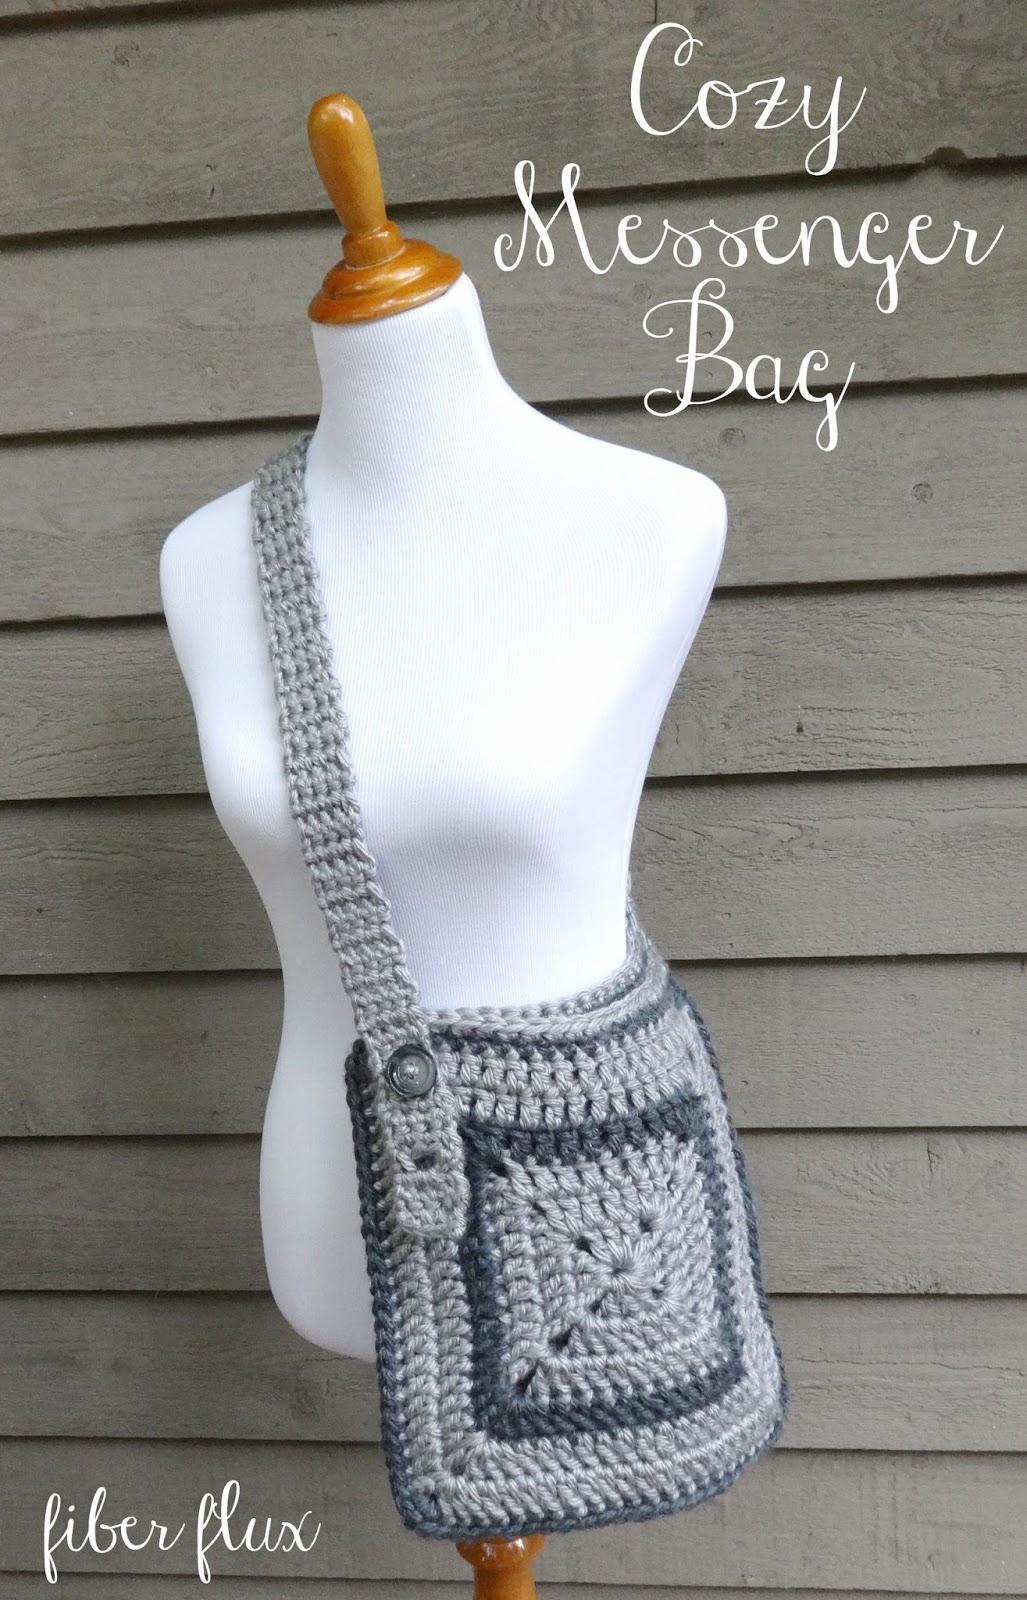 Fiber Flux: Free Crochet Pattern...Cozy Messenger Bag!